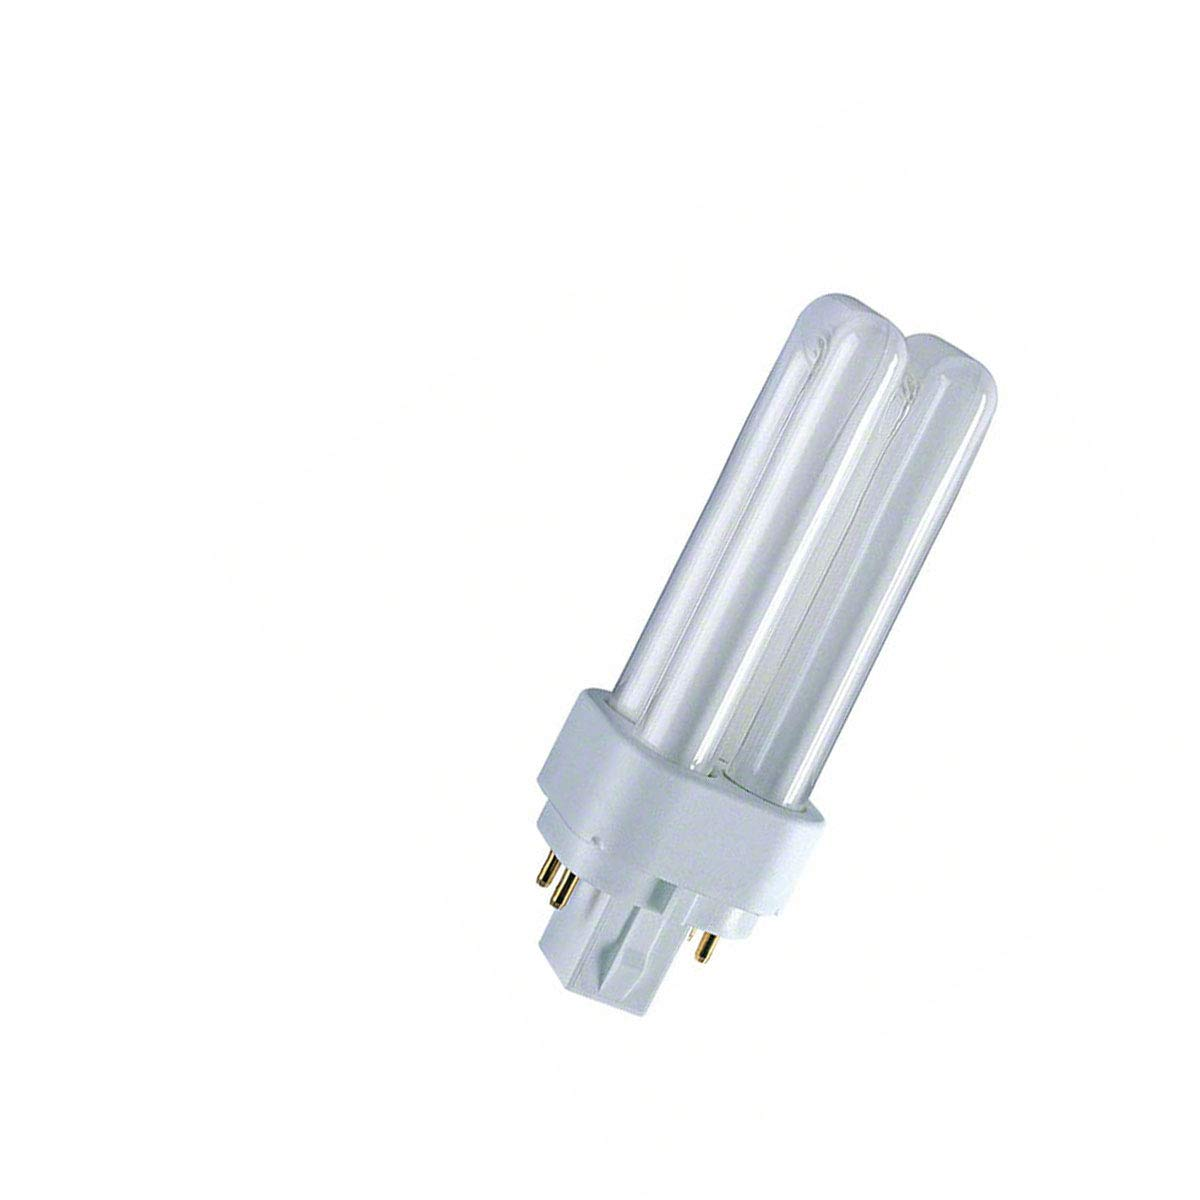 830 Lampada fluorescente compatta Dulux D 26 Watt 2P G24d-3 Osram 10 pz luce naturale